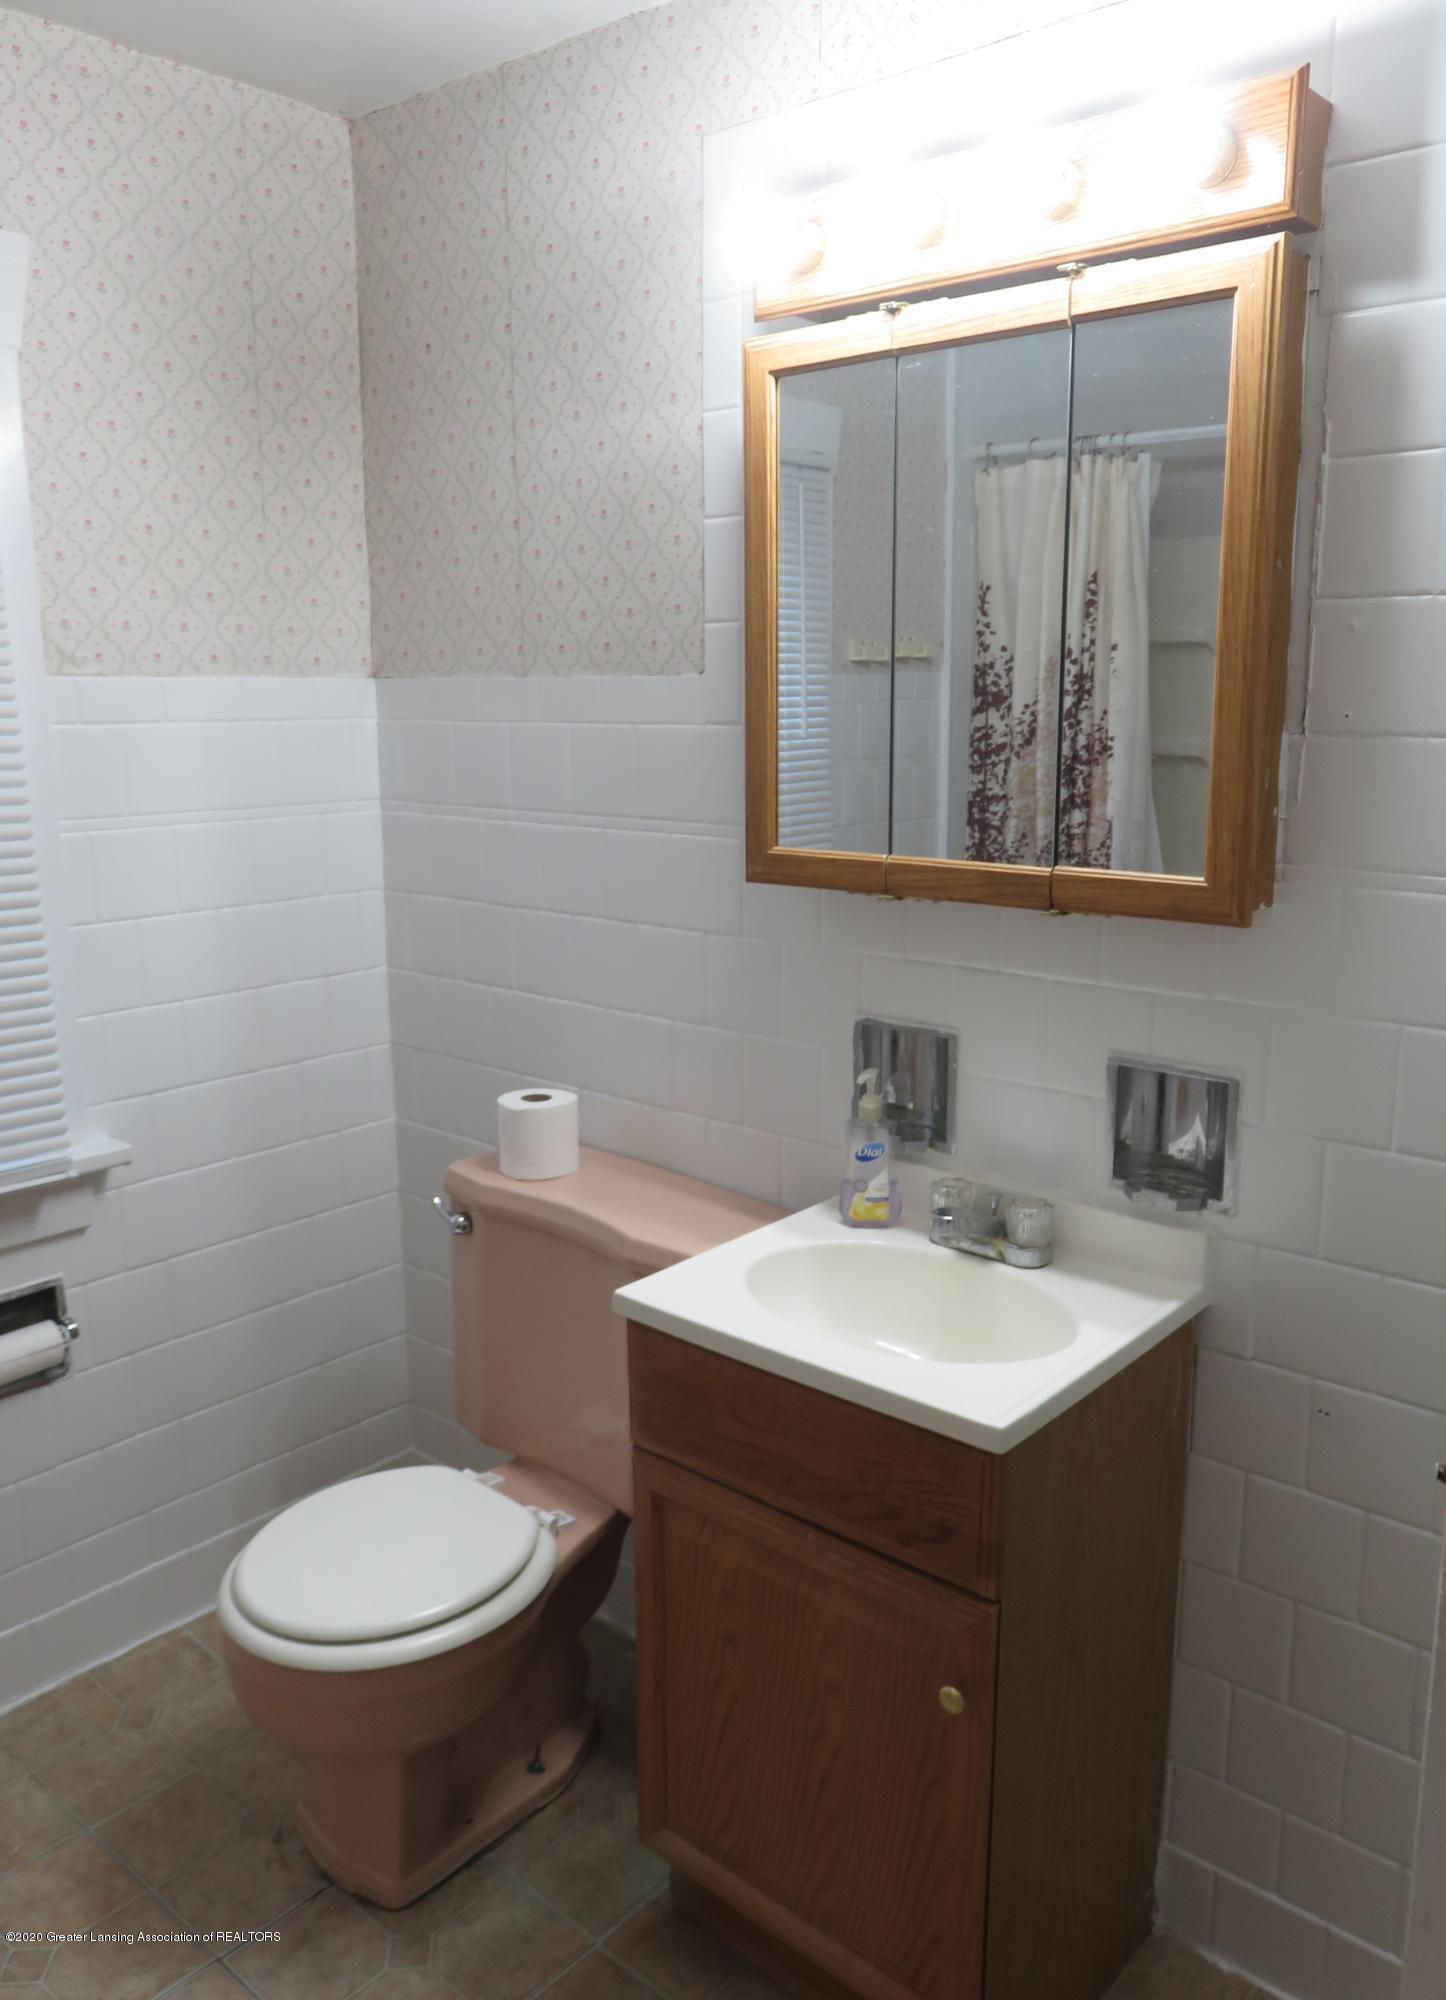 943 Dakin St - Bathroom - 14